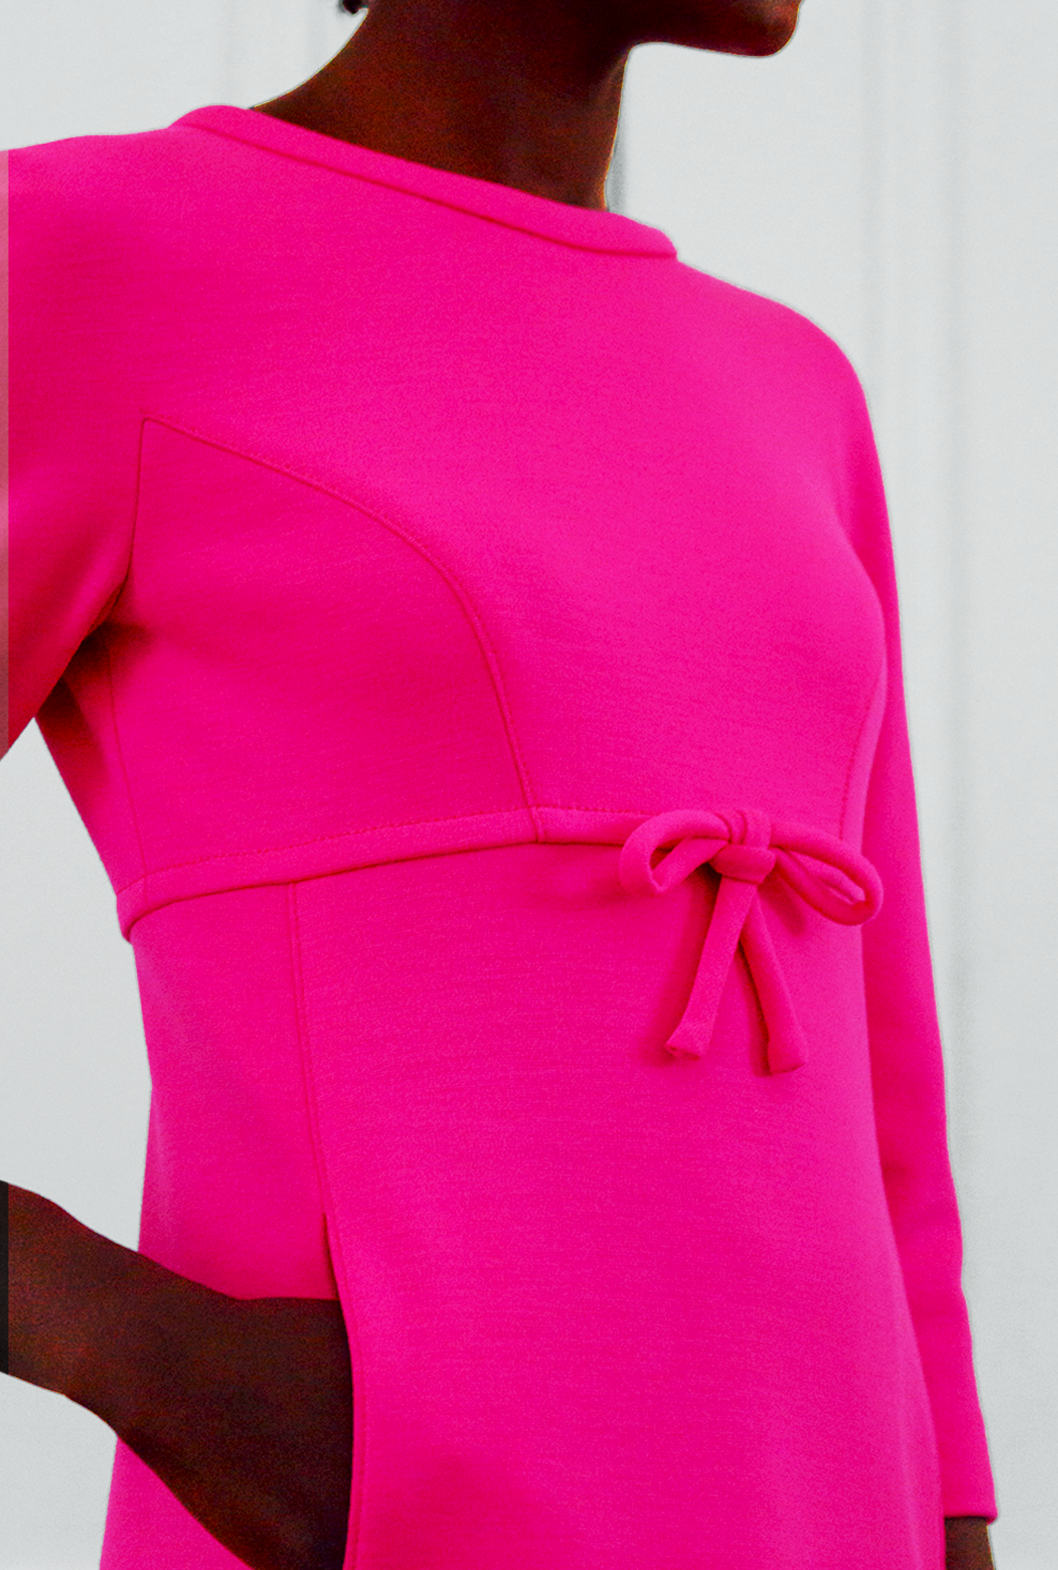 11 M Pink Shift Dress Detail.png